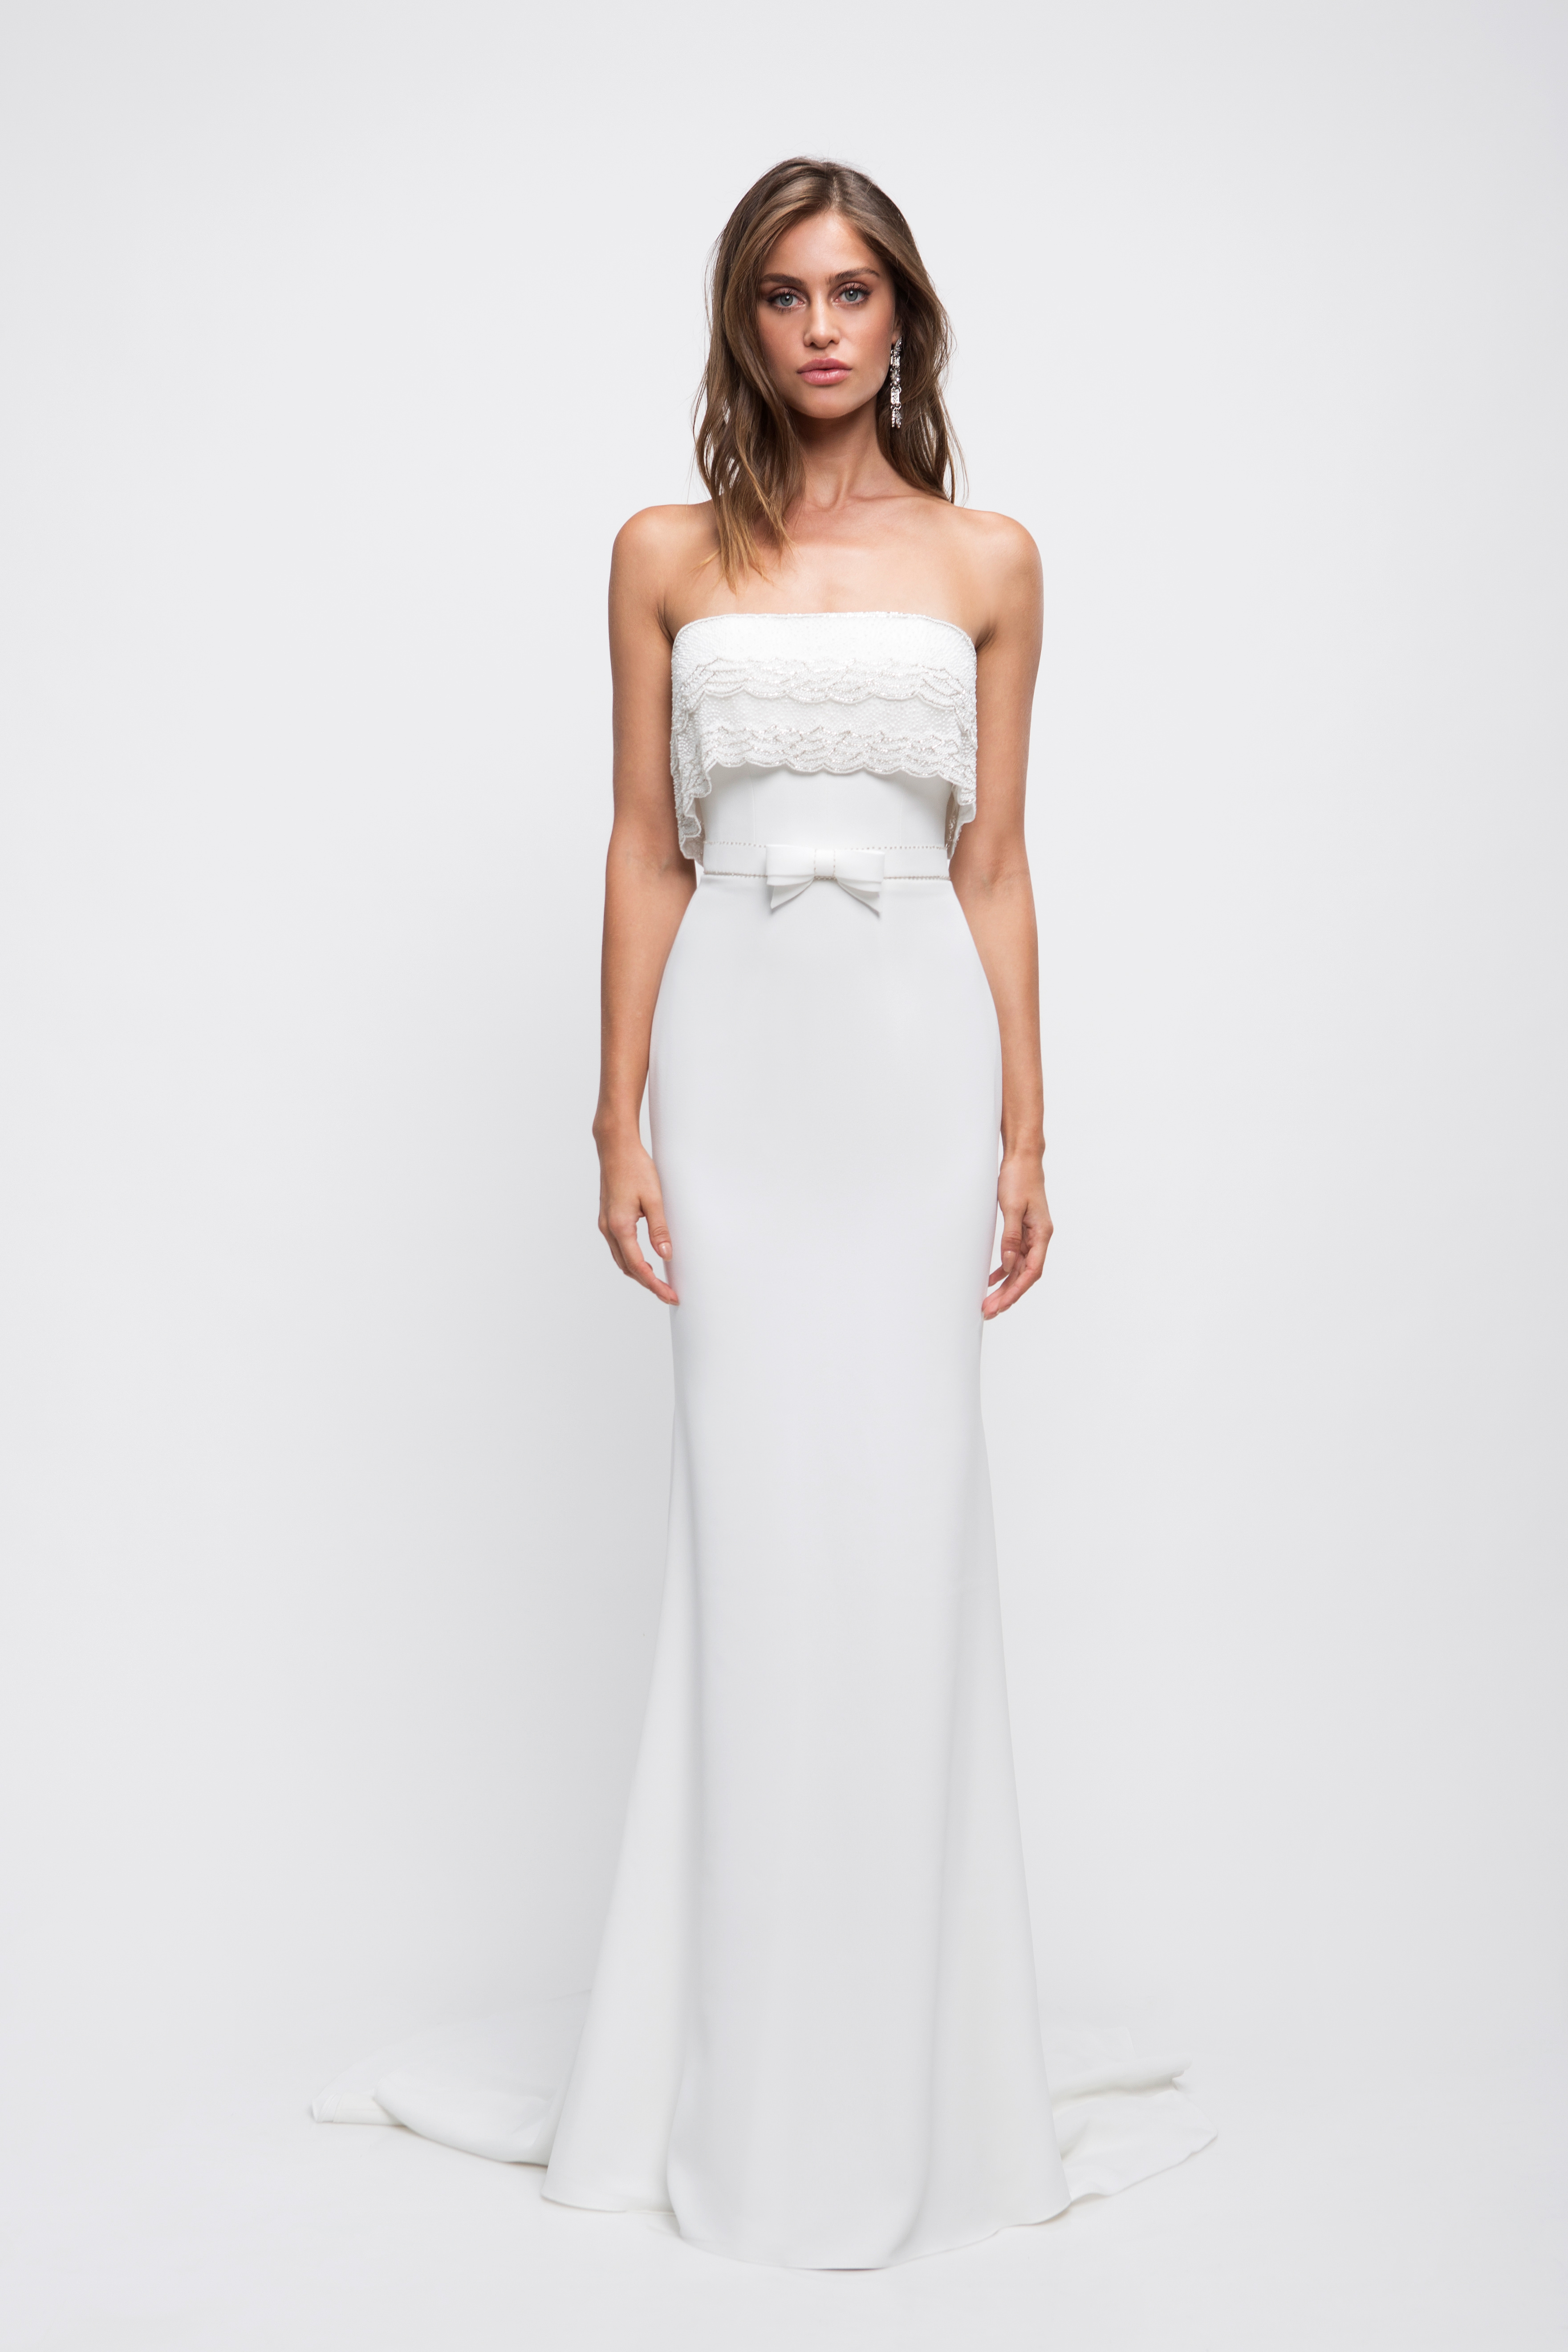 lihi hod wedding dress strapless trumpet bow belt